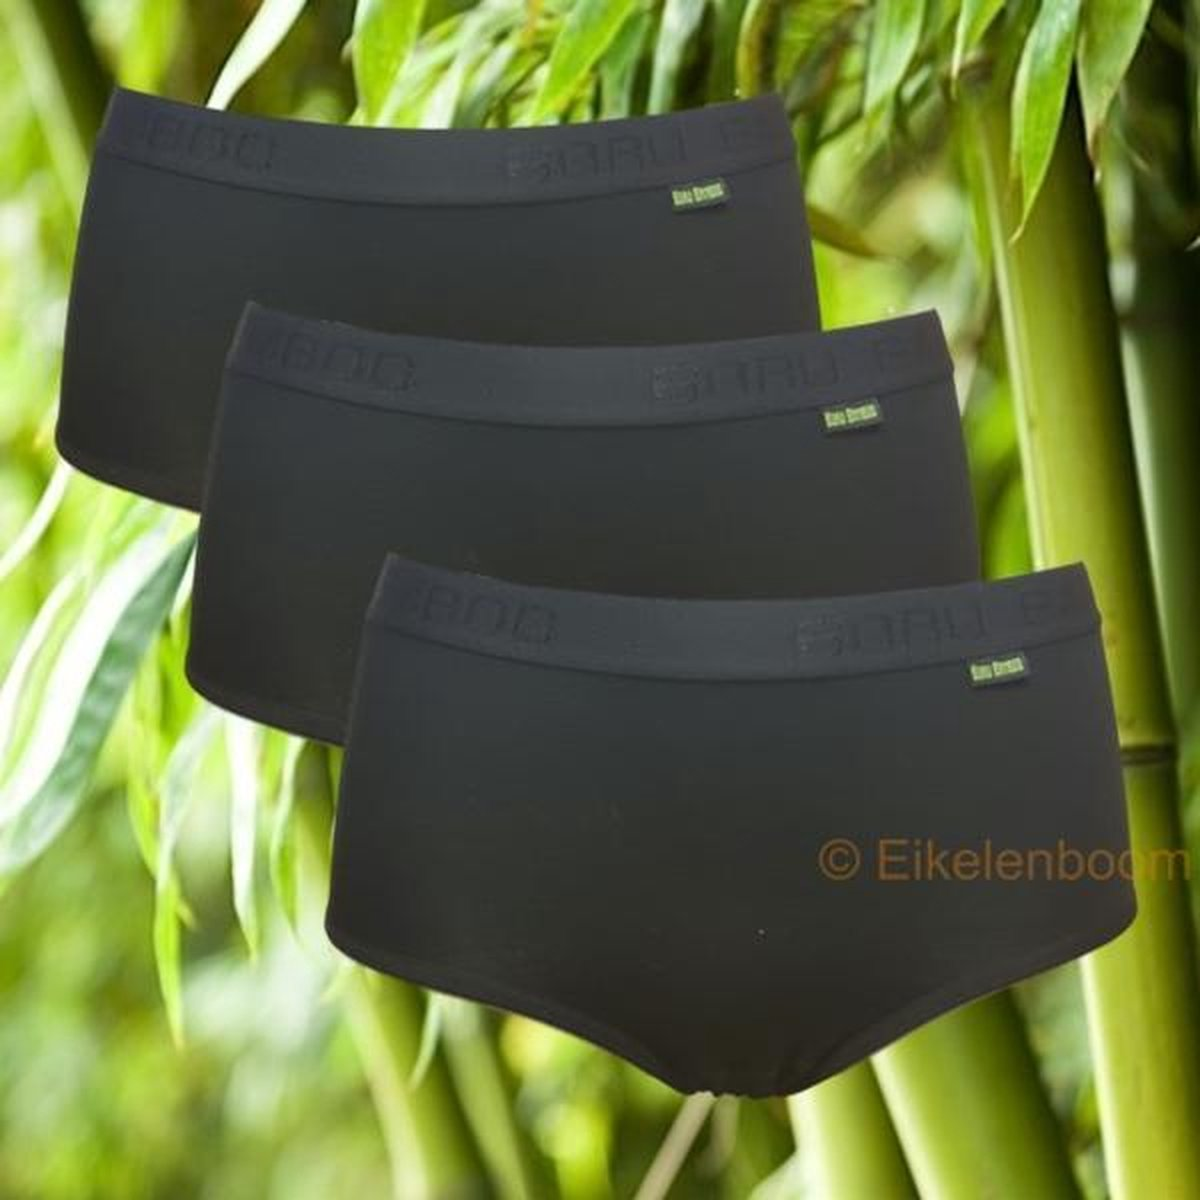 Boru Bamboo | Ondergoed Dames | 3-pack dames midislip | zwart | MAAT M